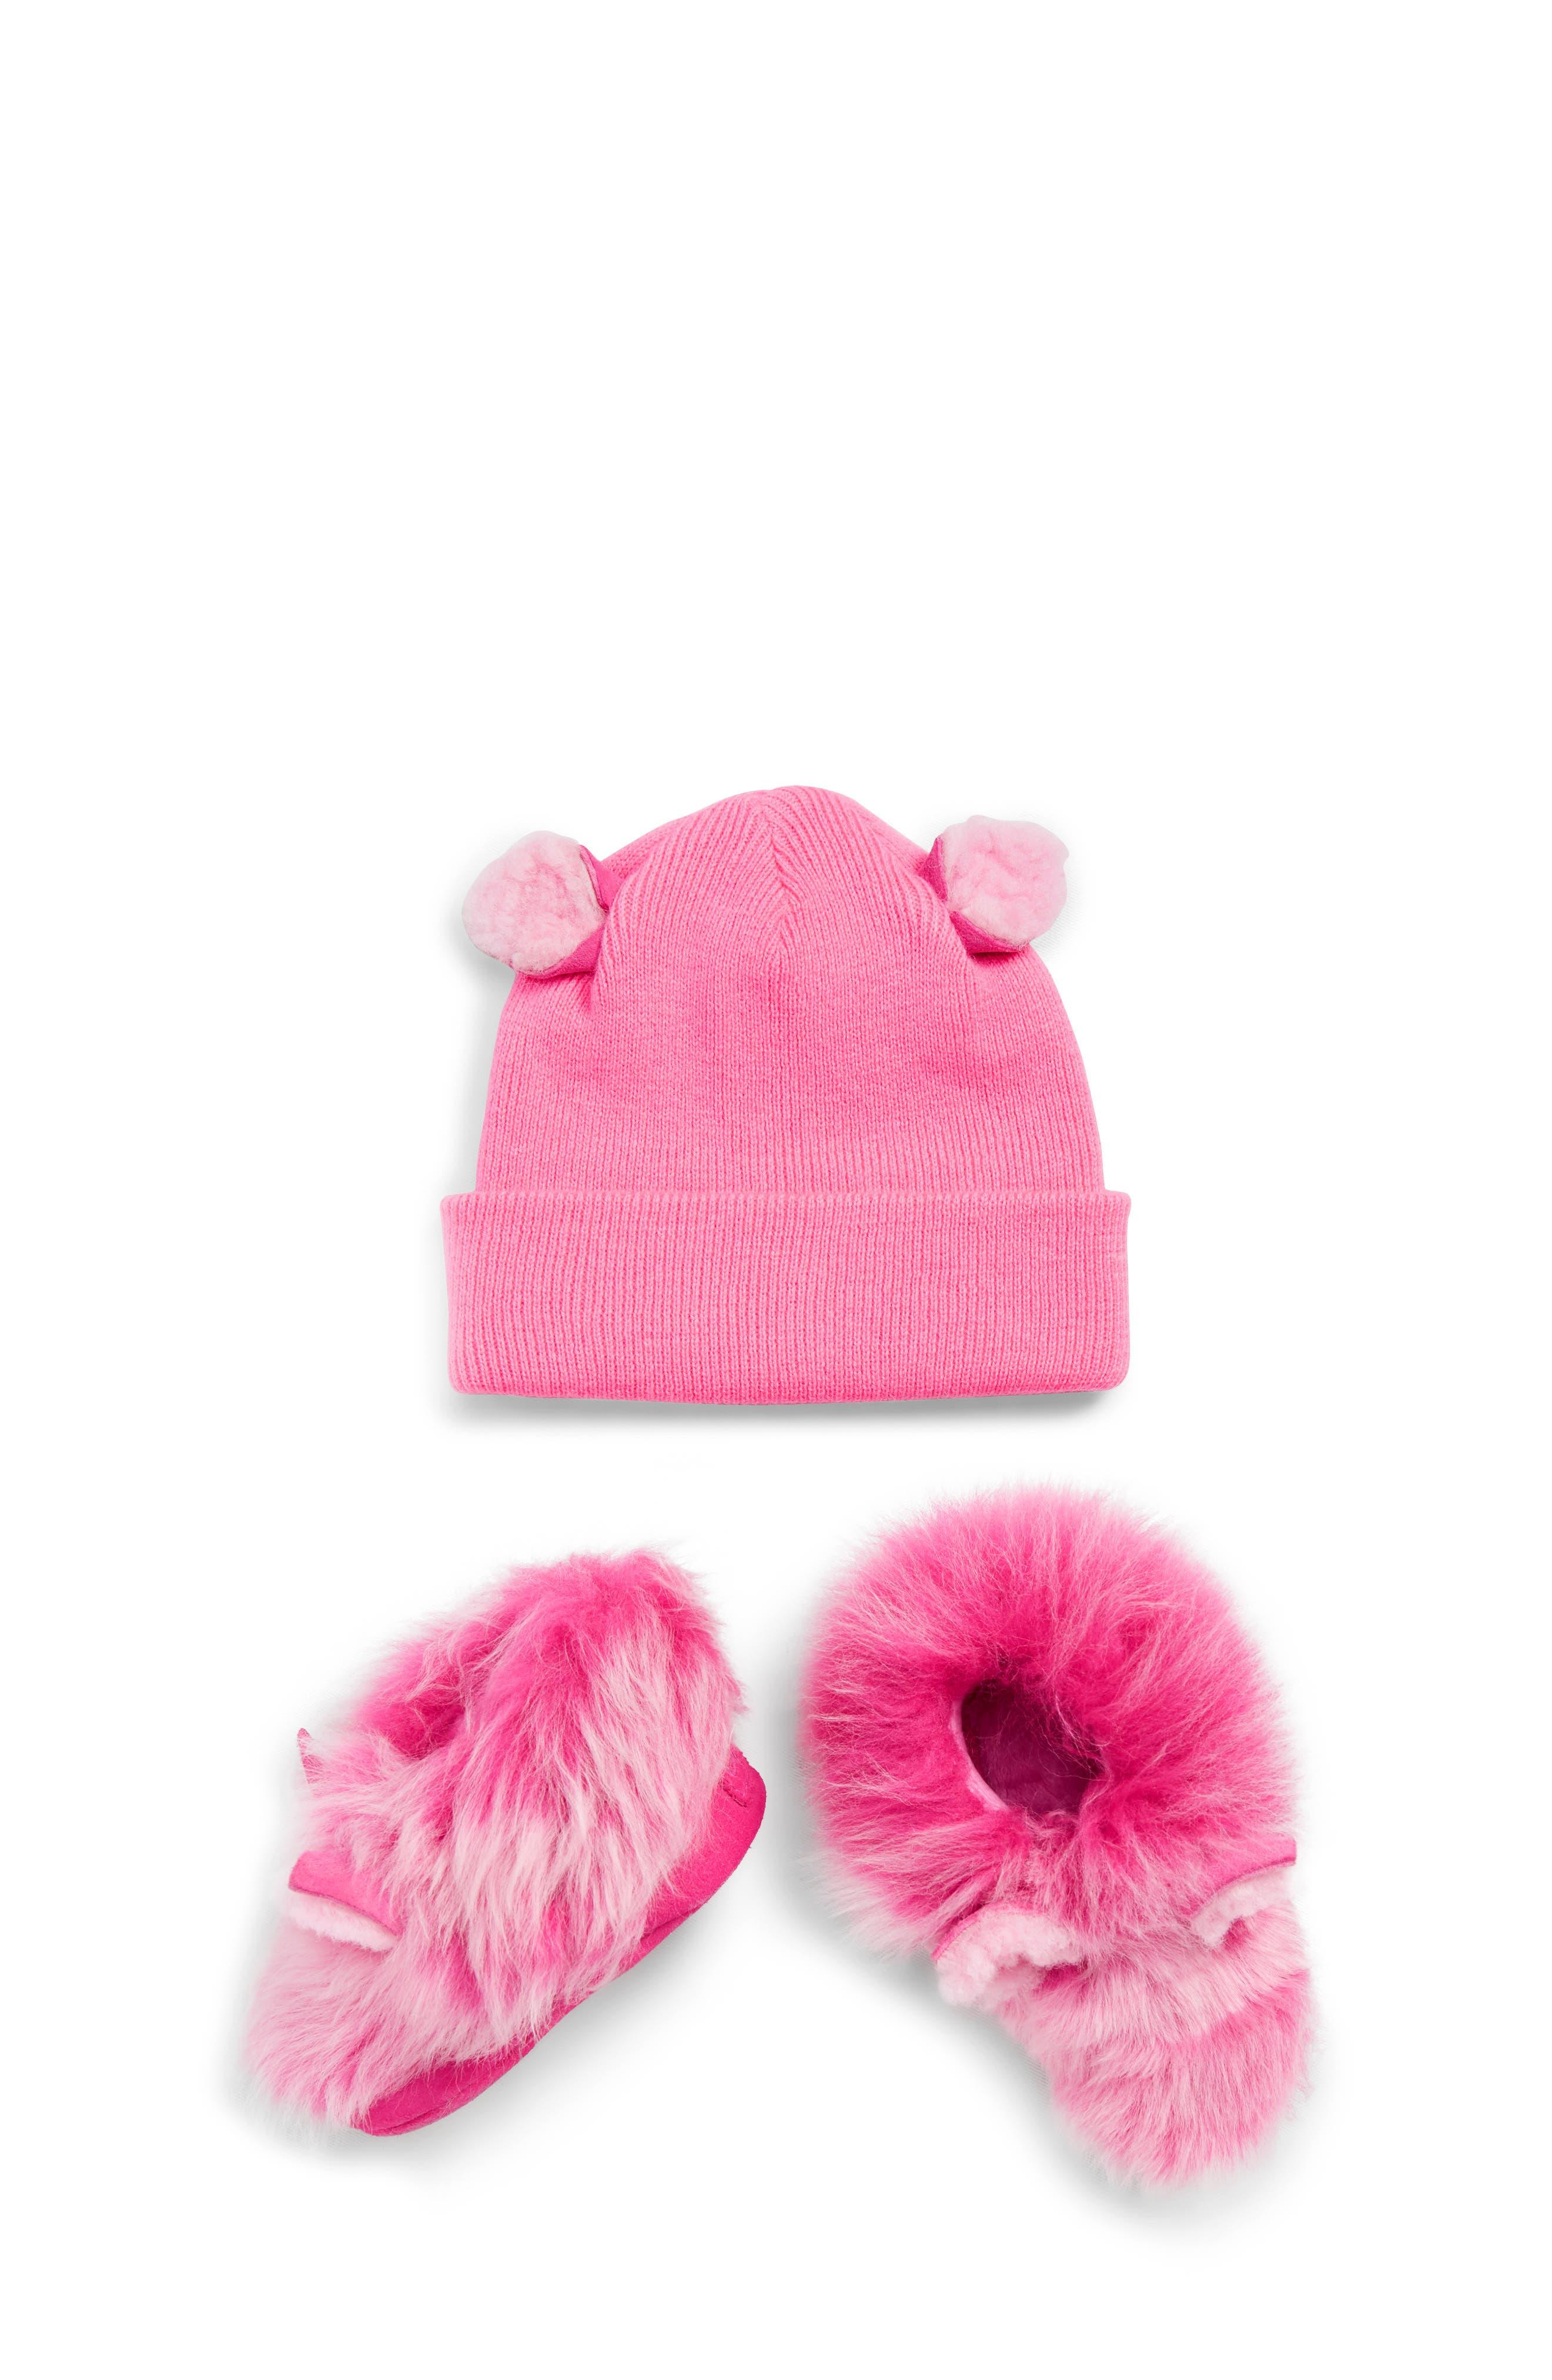 Pinkipuff Genuine Shearling Trim Hat & Booties Gift Set,                             Main thumbnail 1, color,                             PINK AZALEA